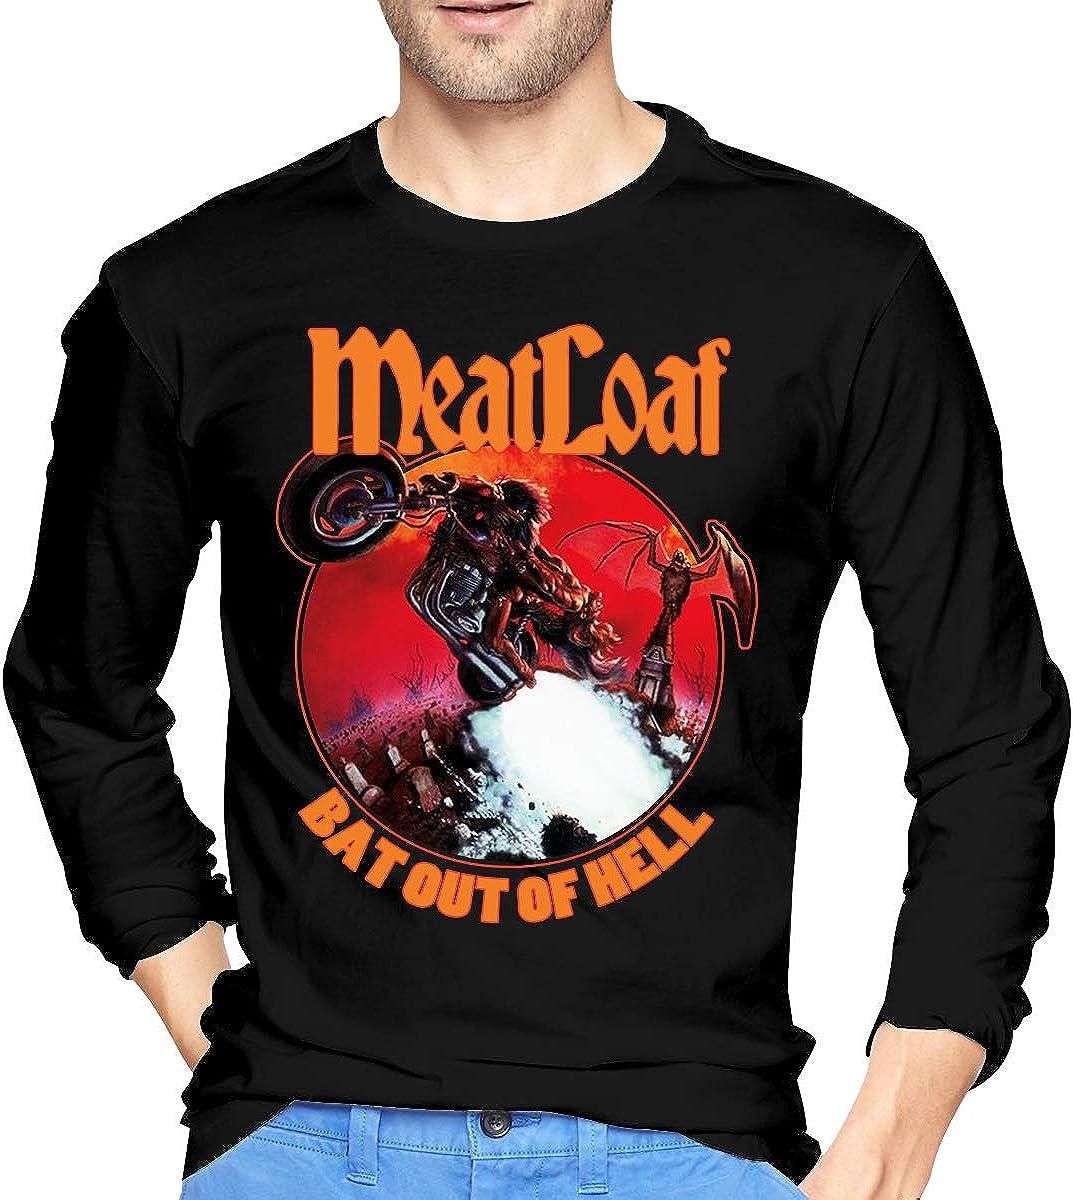 Ropa Deportiva Camisas Casual Mens Meat Loaf Band Bat out of Hell Long Sleeve Tshirts Black Hombre Camisetas de Manga Larga